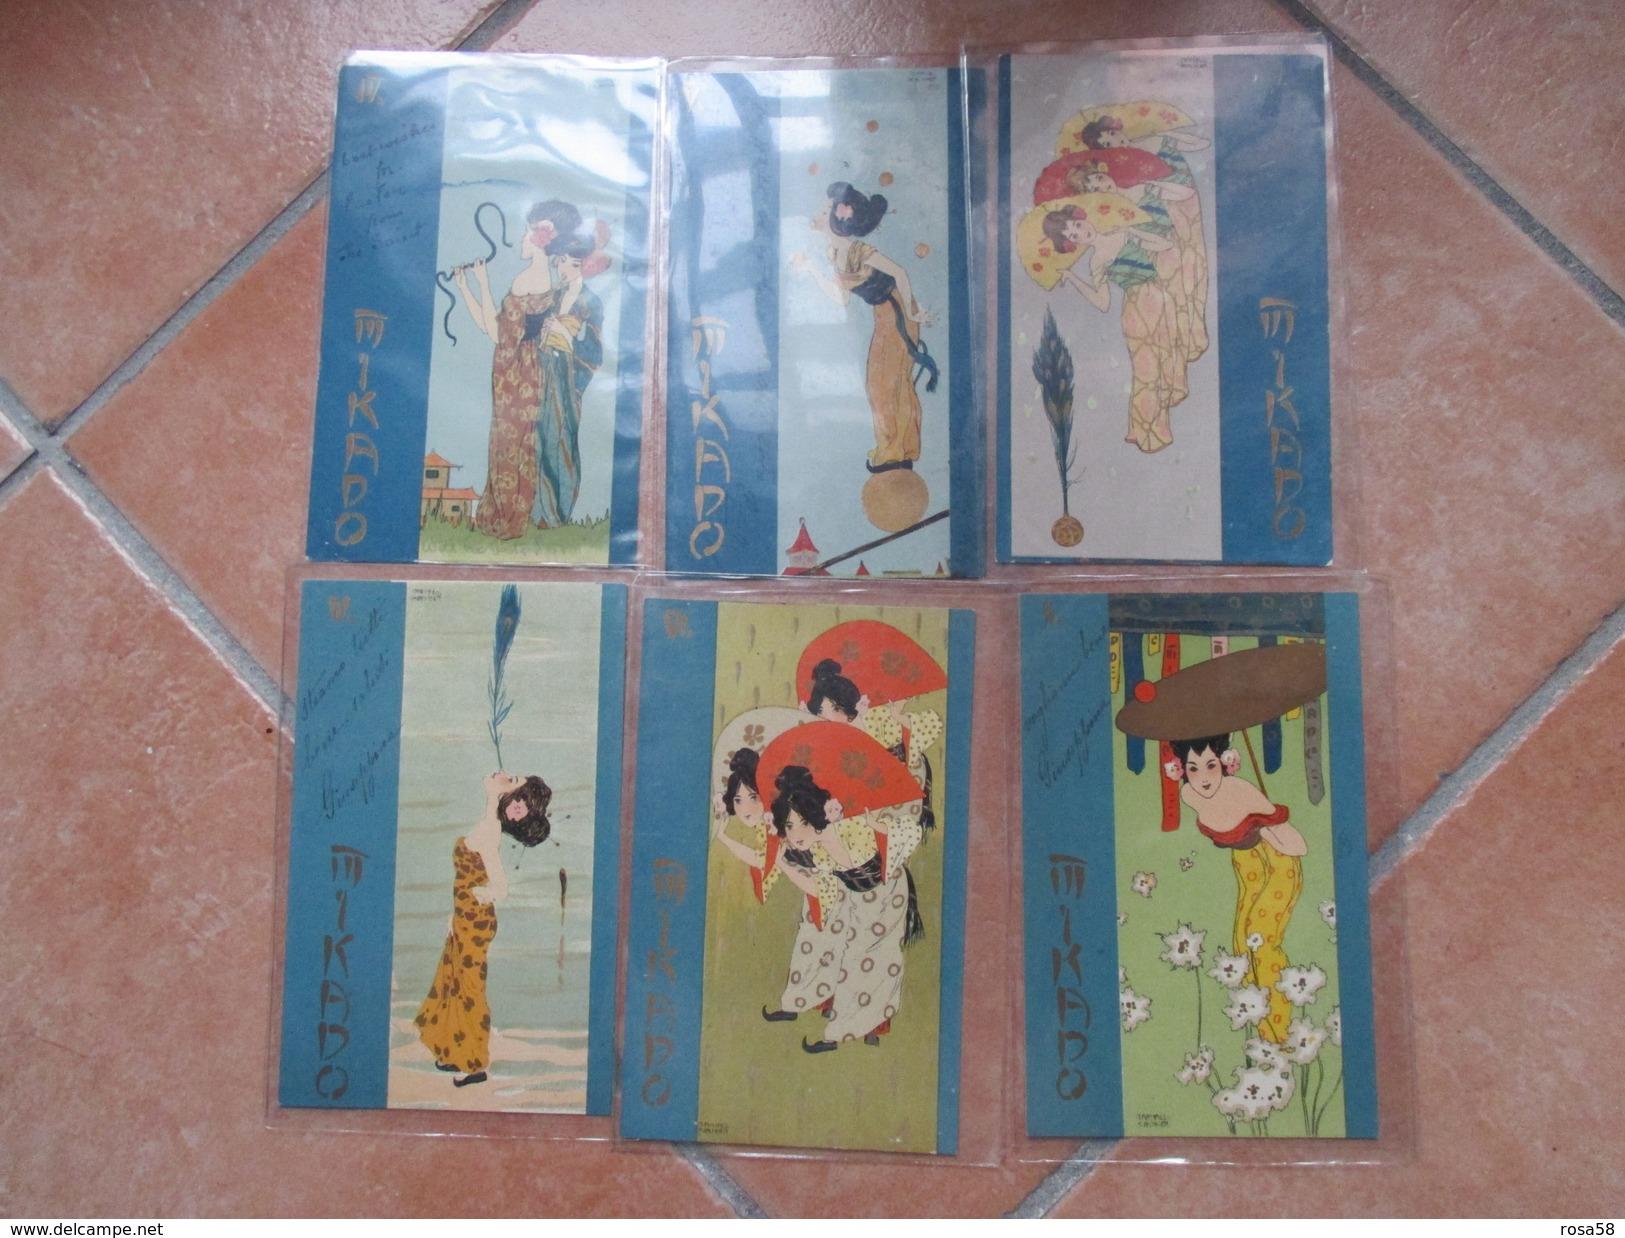 Raphael KIRCHNER Serie Completa MIKADO N.6 Different Postcards Originali Epoca Viaggiate Affrancate - Kirchner, Raphael